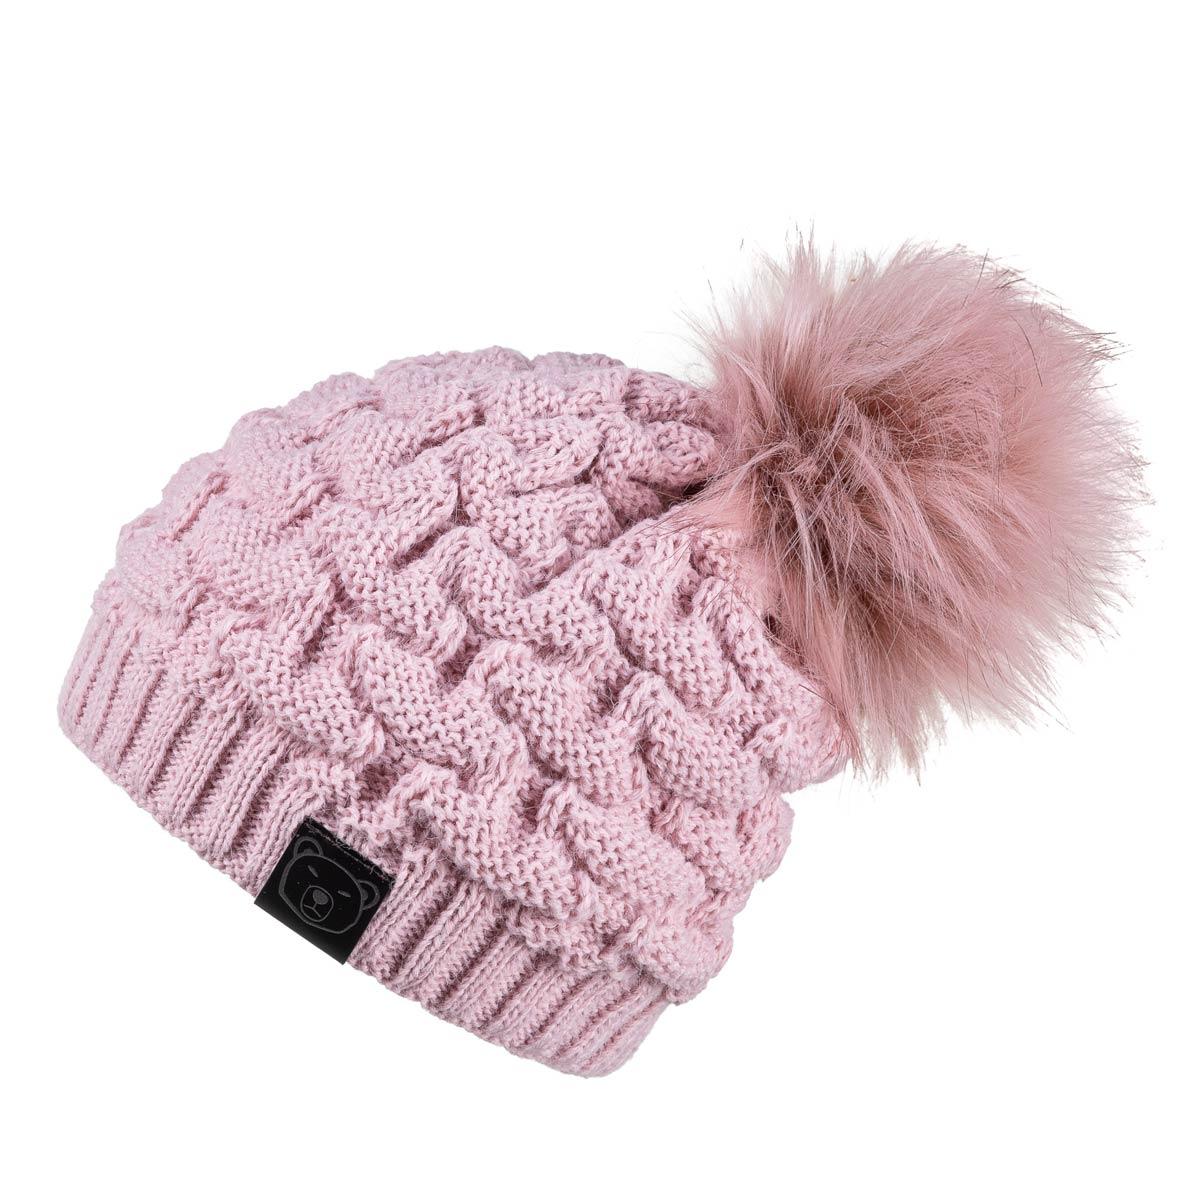 CP-01600-F12-bonnet-femme-rose-pompon